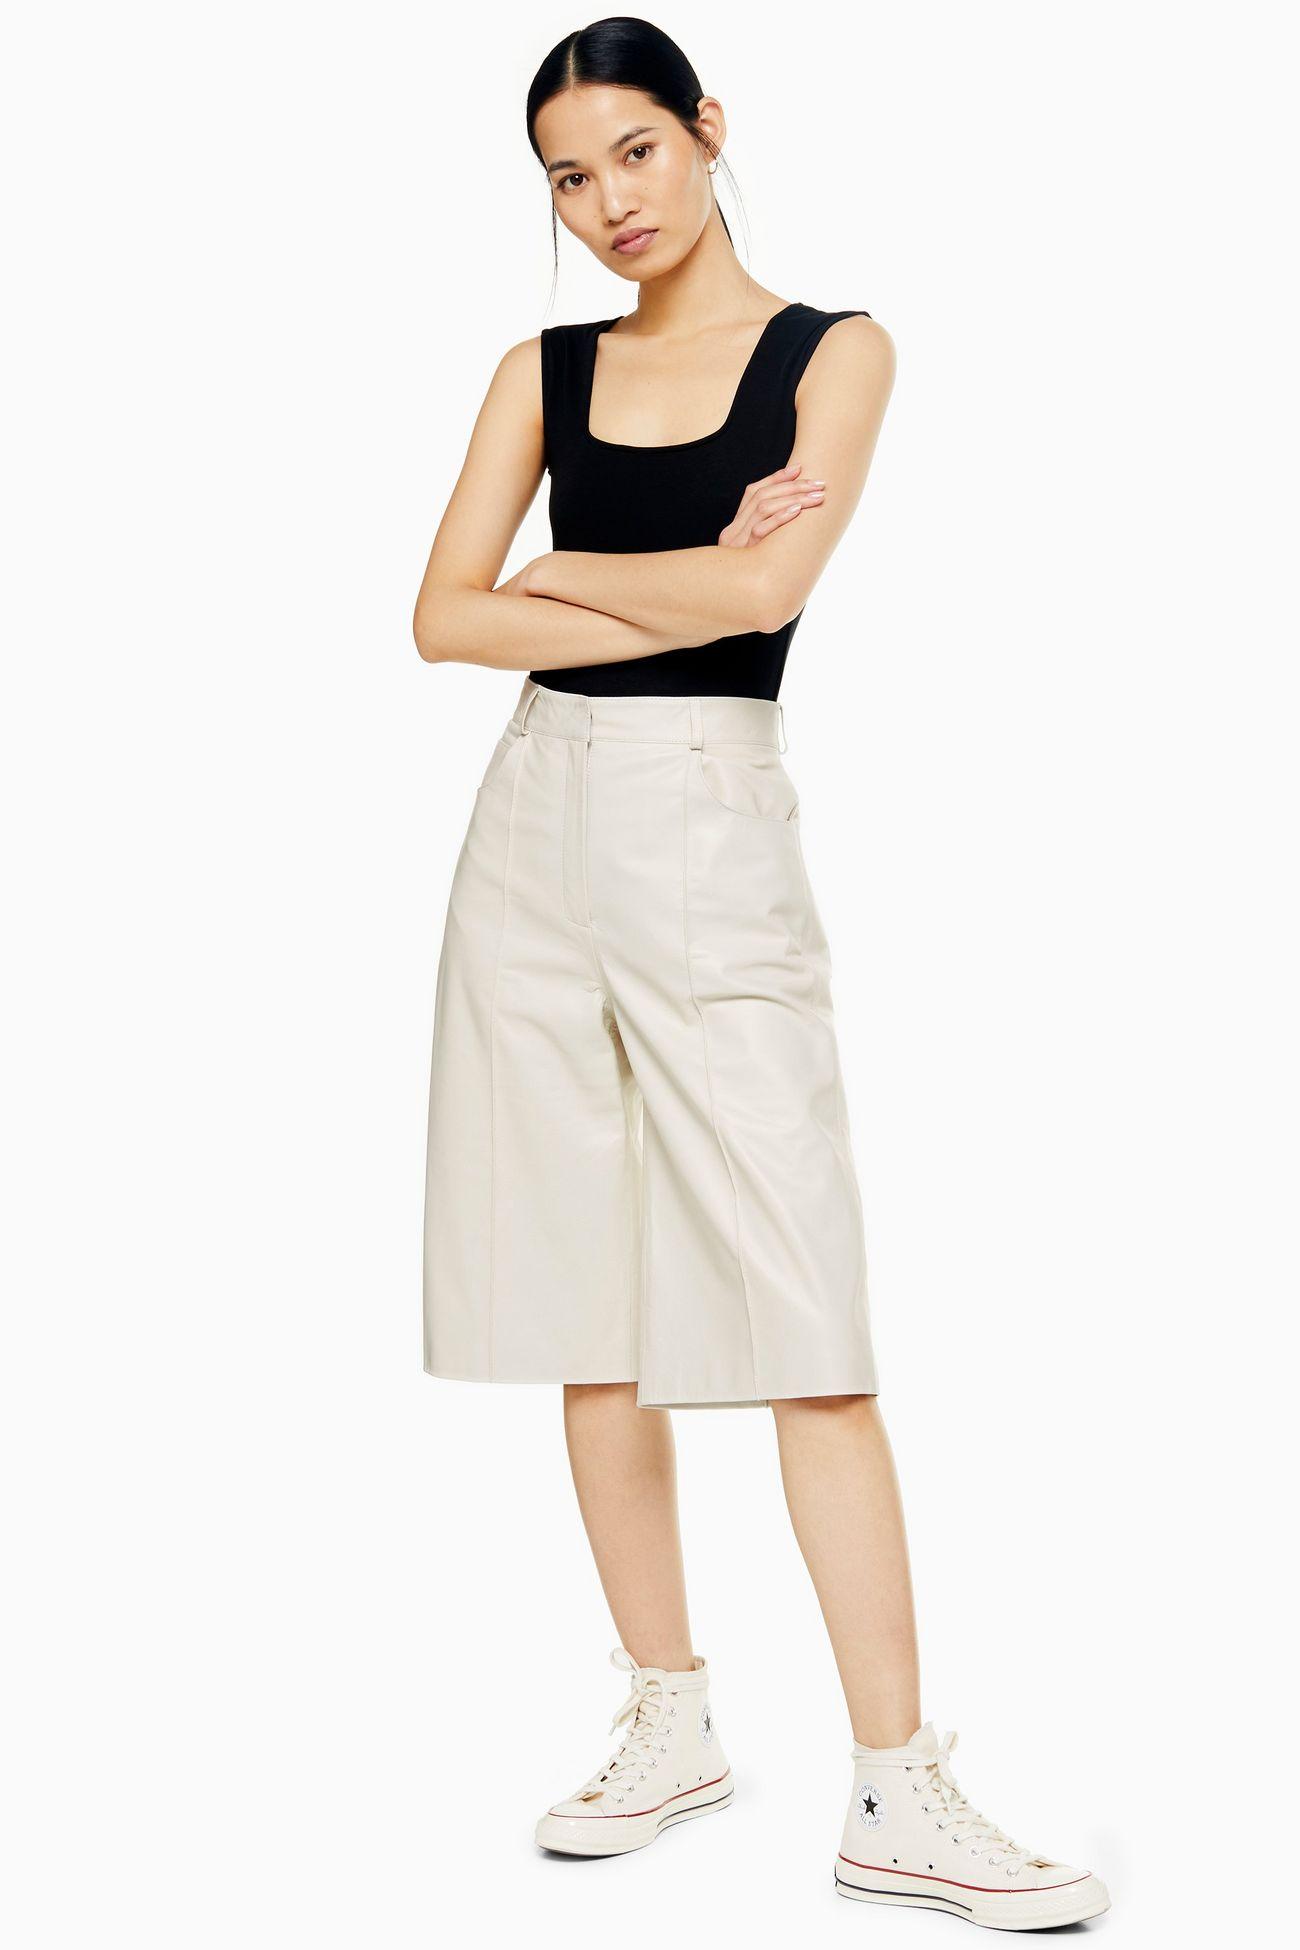 Topshop bermuda shorts